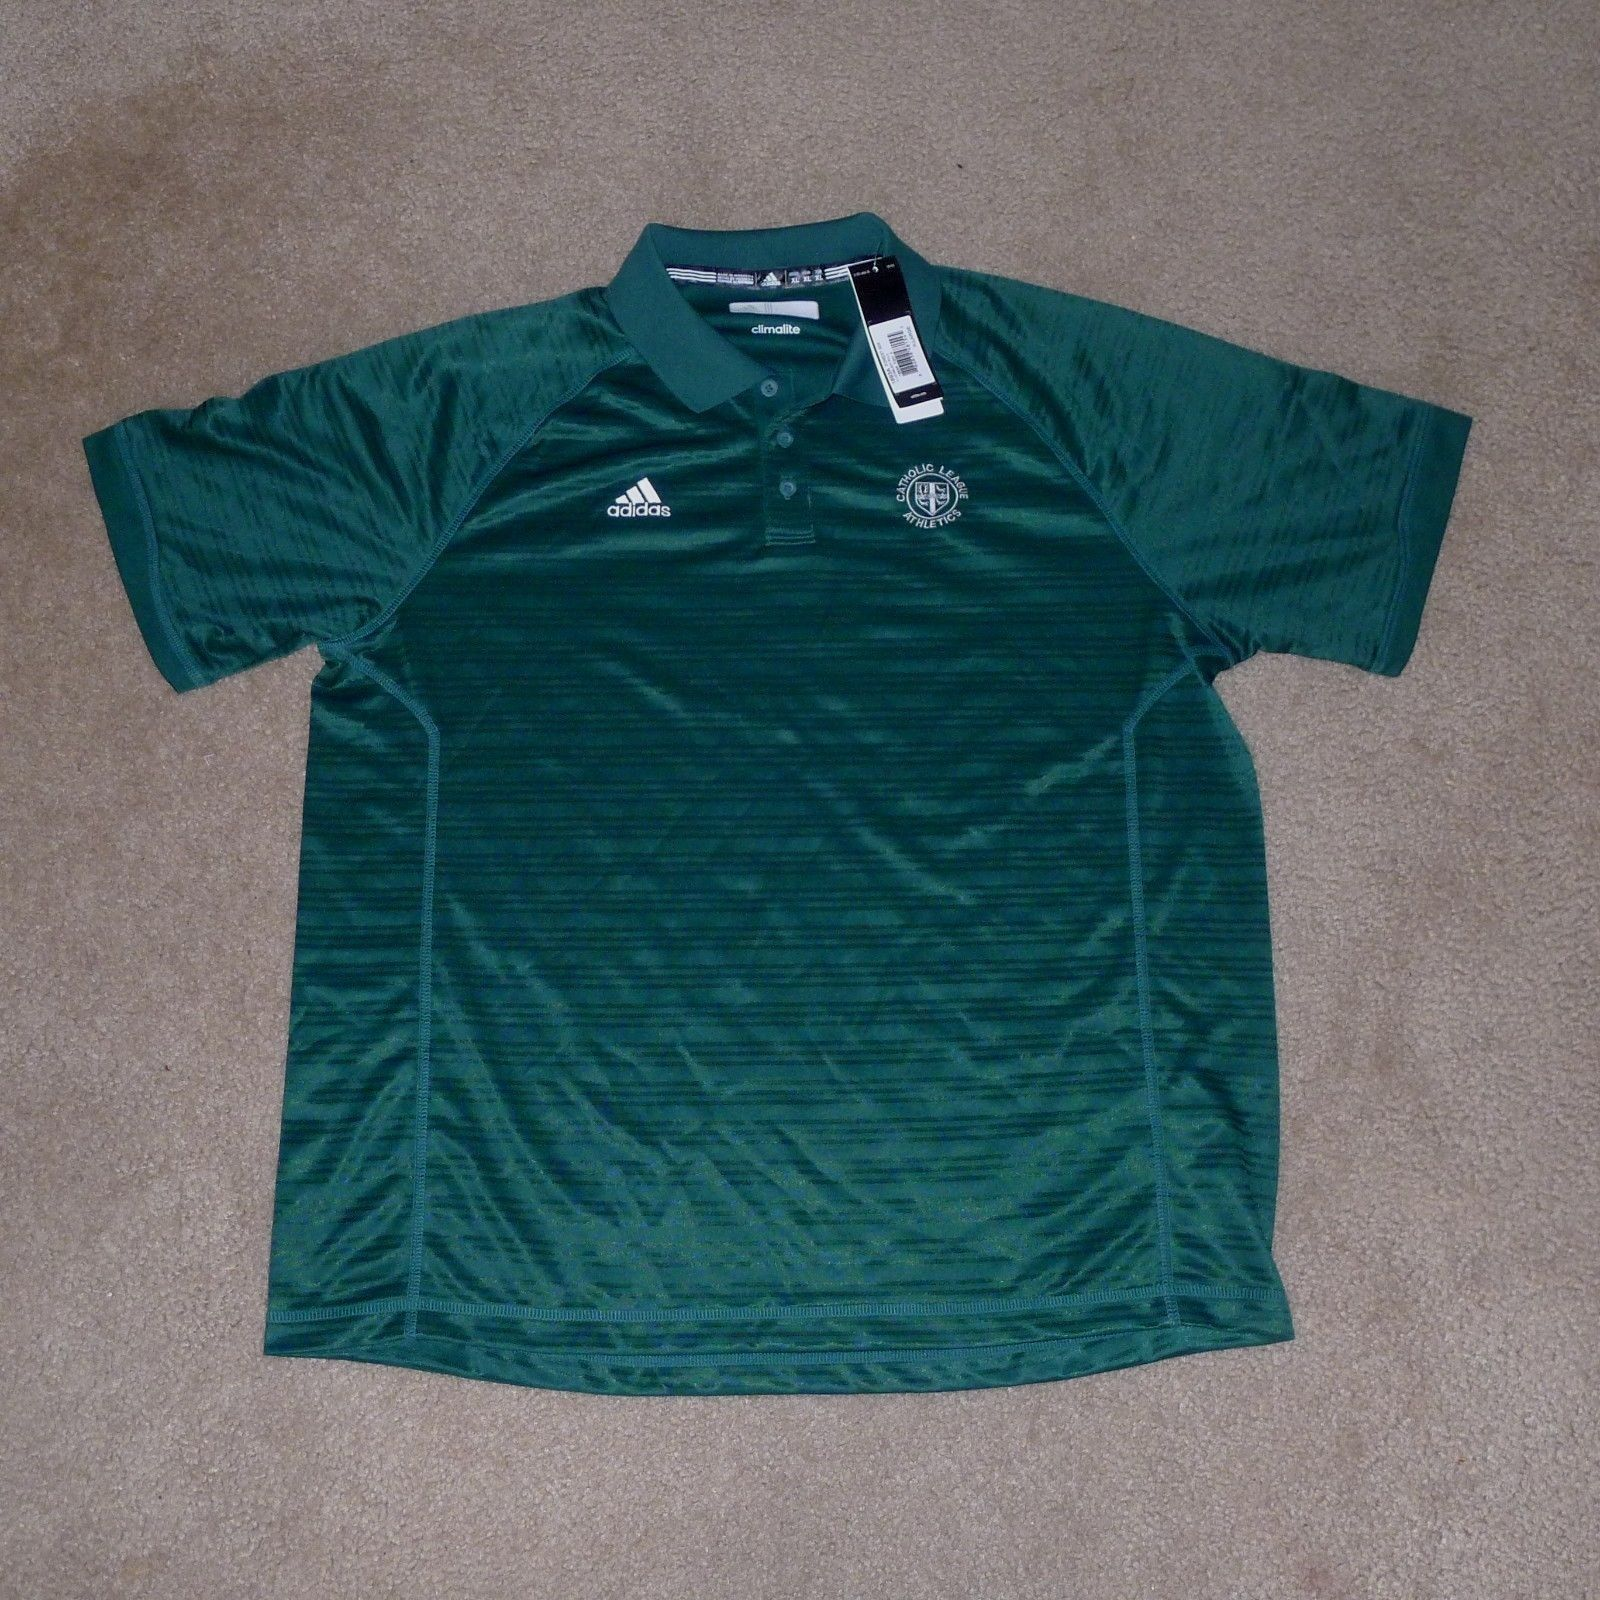 Adidas Clima Lite, Catholic League Athletics Polo Shirt, Green, Large , NWT